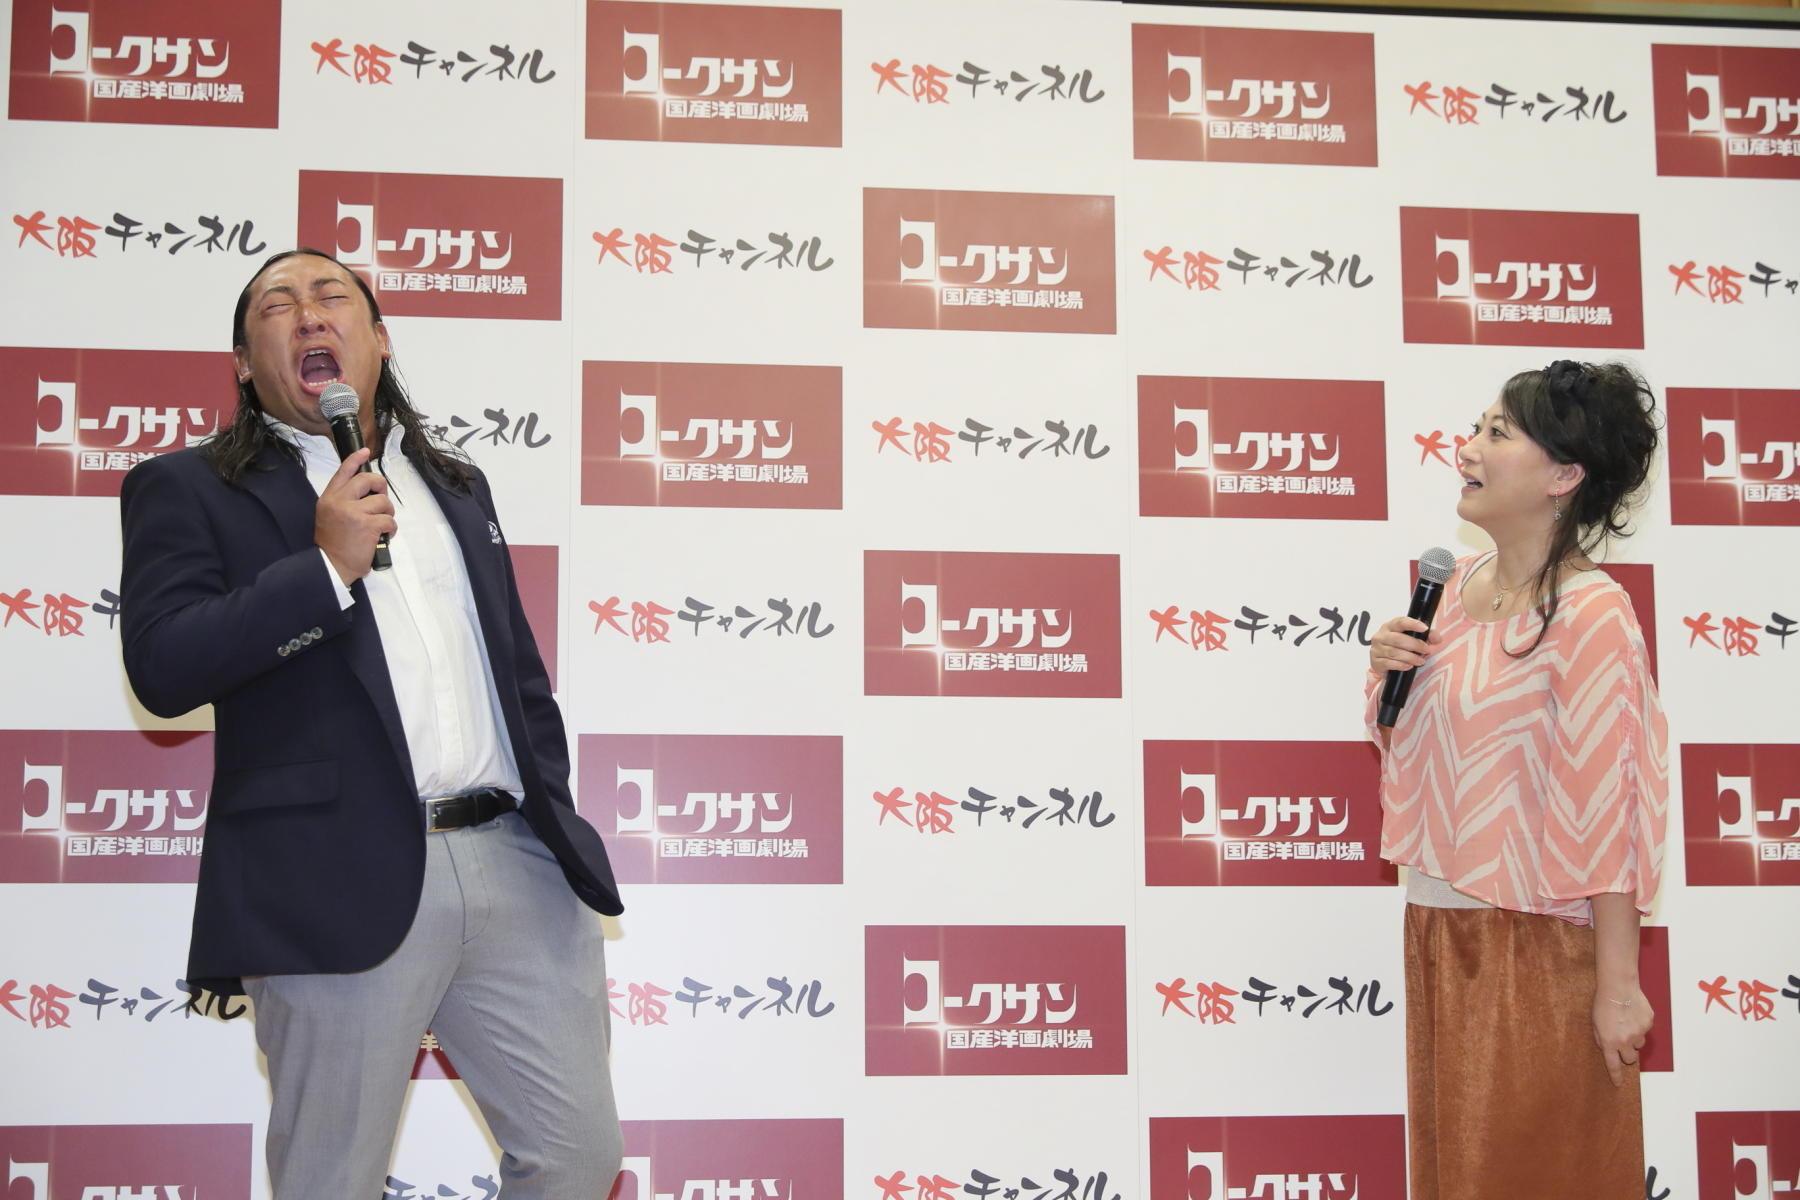 http://news.yoshimoto.co.jp/20180831163328-0ed886f77a811c643b8fdddb8ee9b4814cee2500.jpg